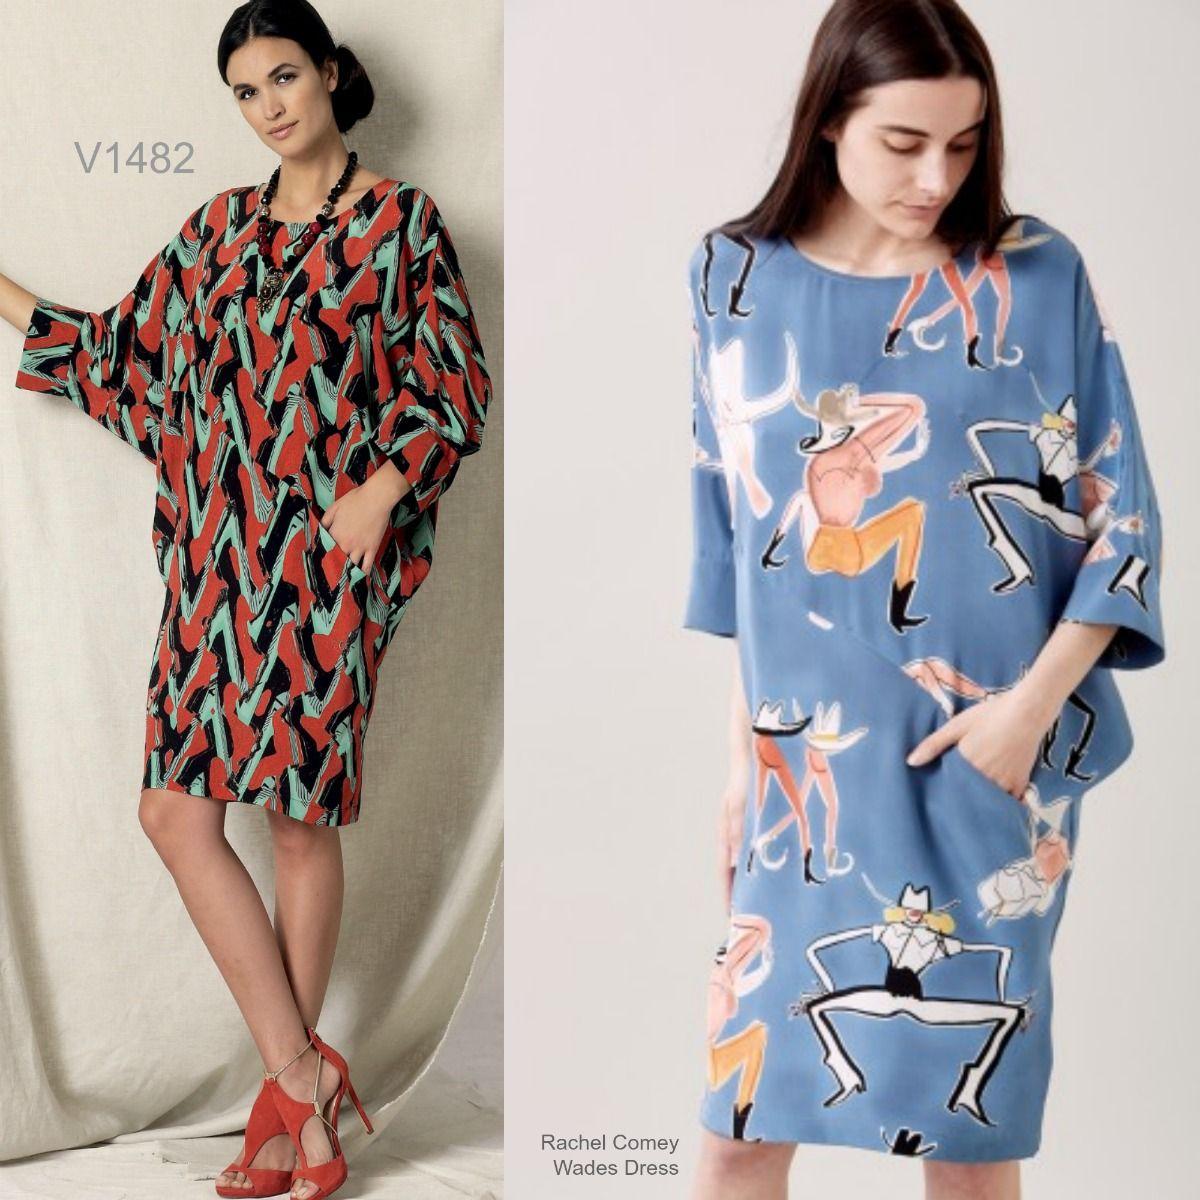 Vogue-1482-XY Vogue Ladies Sewing Pattern 1482 Batwing Dolman Sleeve Dress